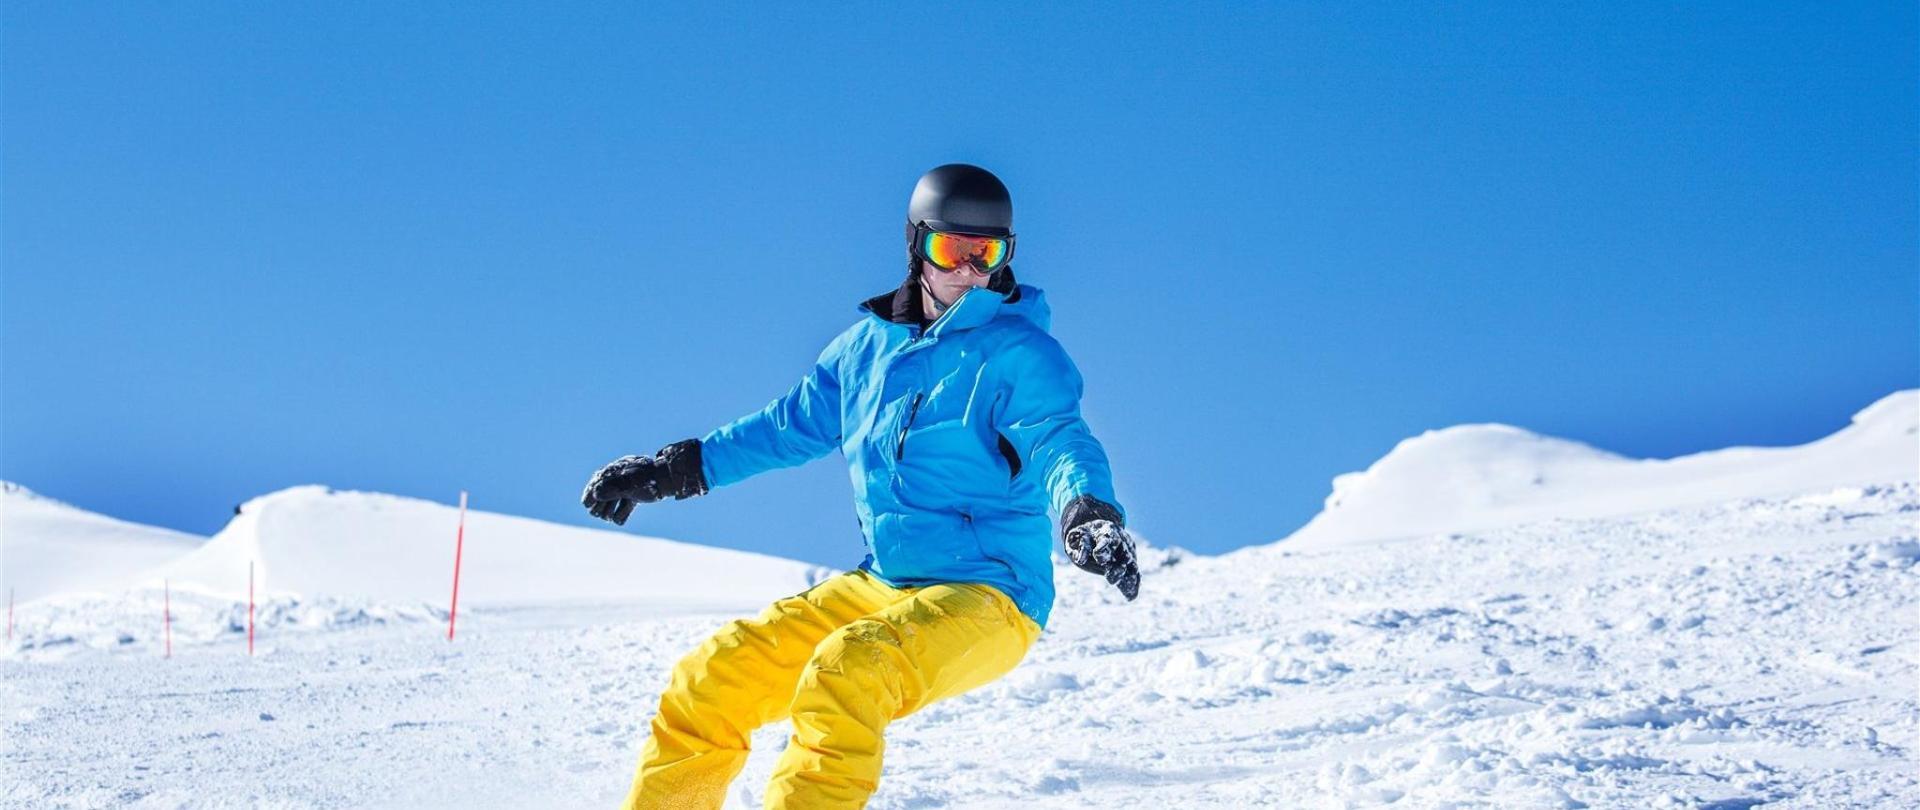 bigstock-snowboarder-sliding-down-the-h-46353307.jpg